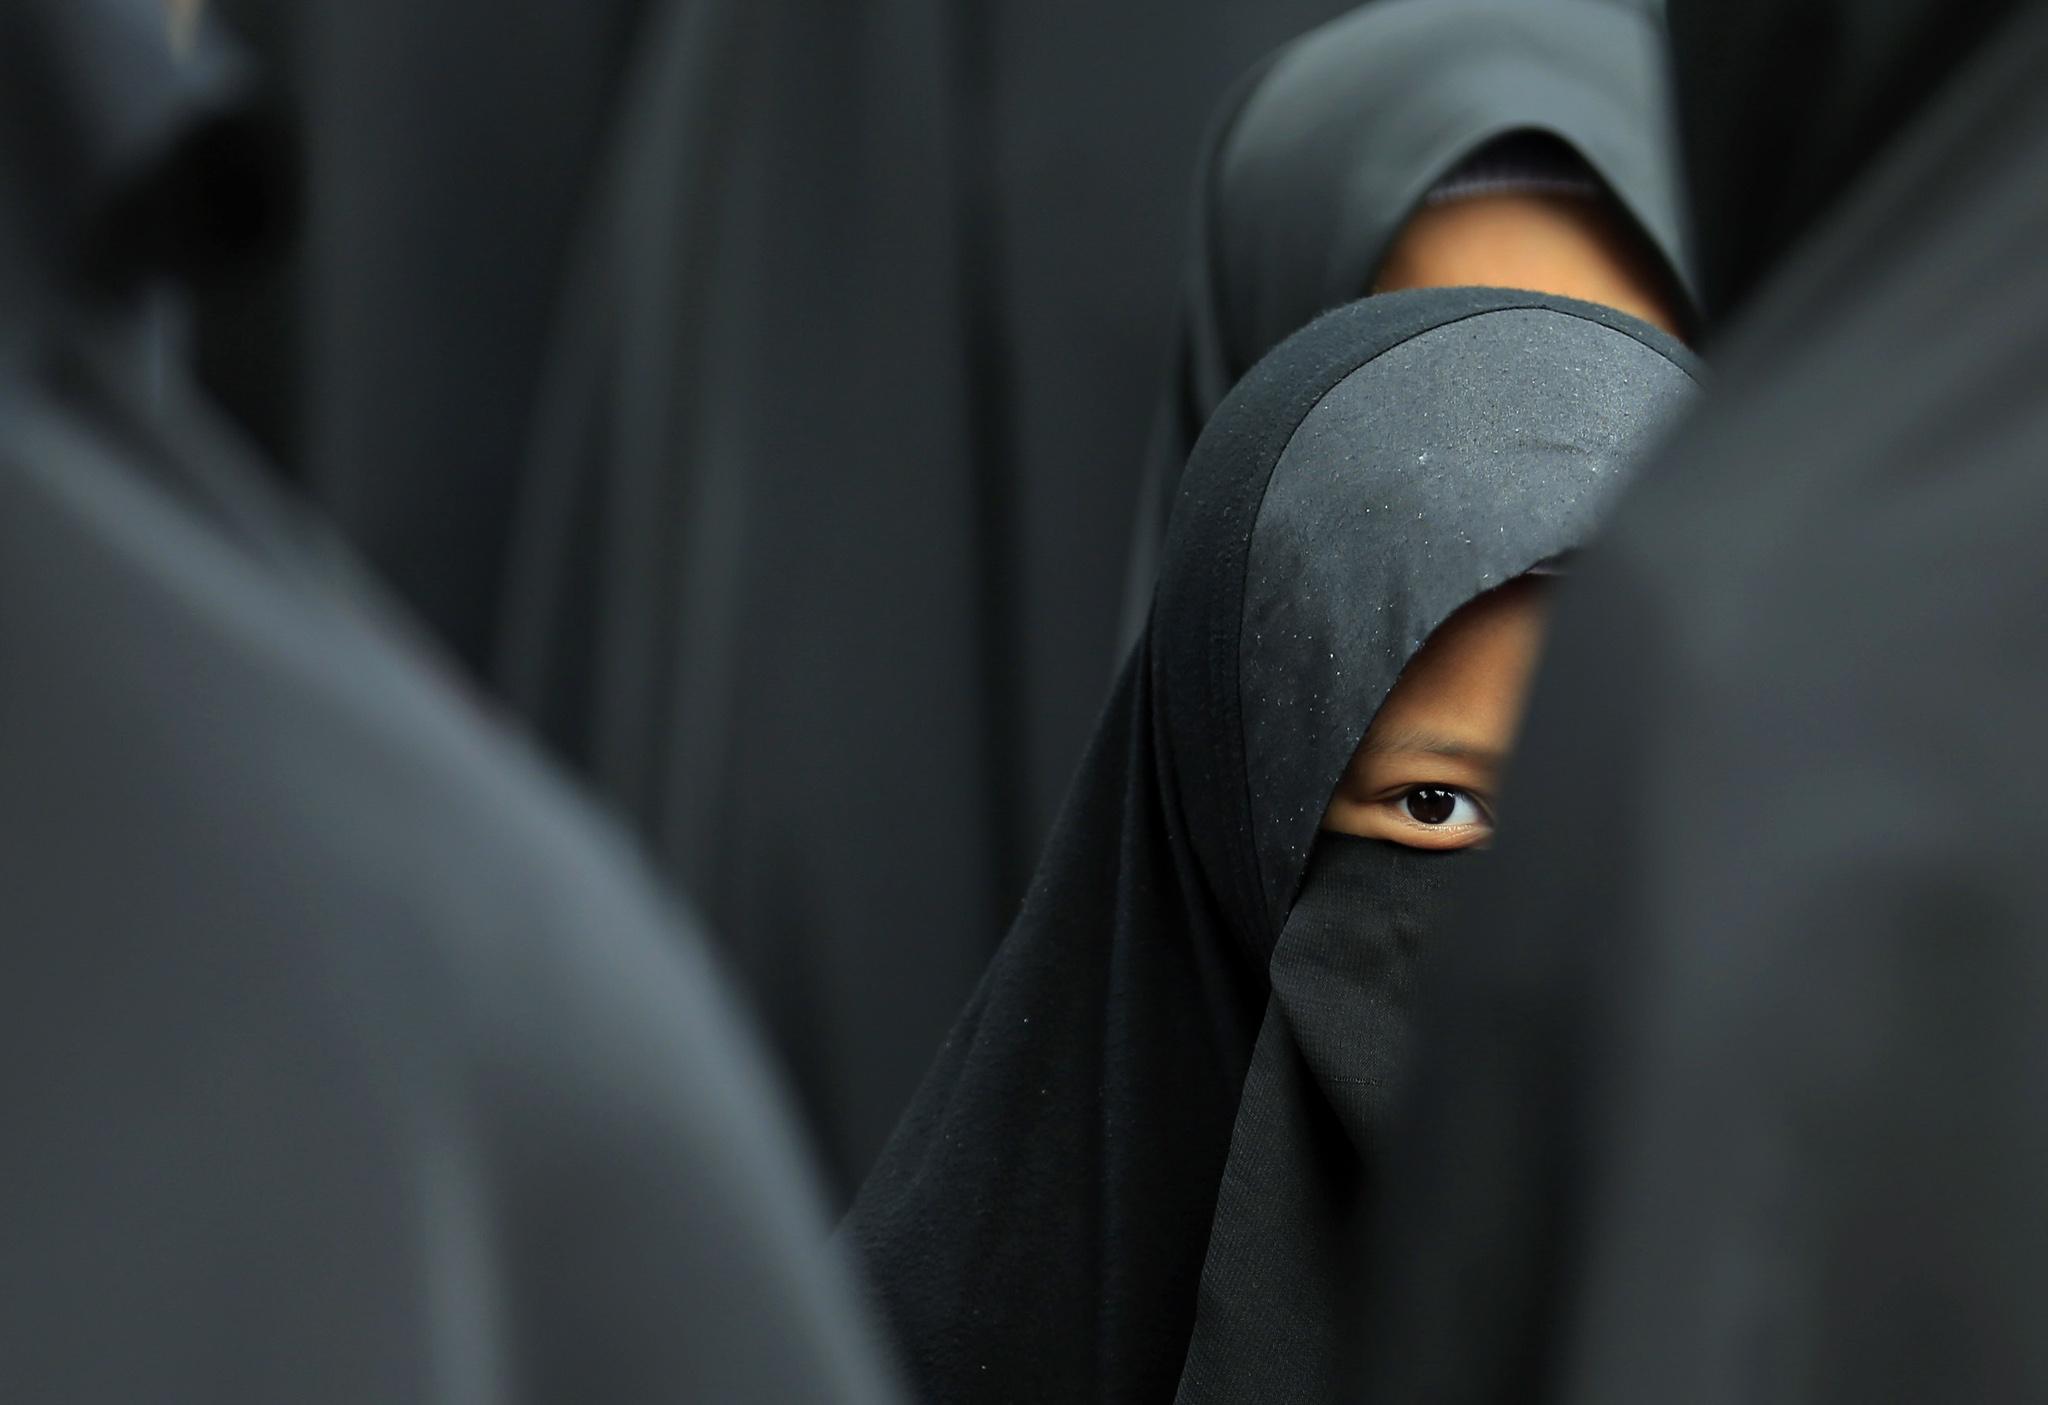 A girl wearing a hijab waits at the Shah Alam stadium during celebrations of Maulidur Rasul, or the birth of Prophet Muhammad, outside Kuala Lumpur...A girl wearing a hijab waits at the Shah Alam stadium during celebrations of Maulidur Rasul, or the birth of Prophet Muhammad, outside Kuala Lumpur